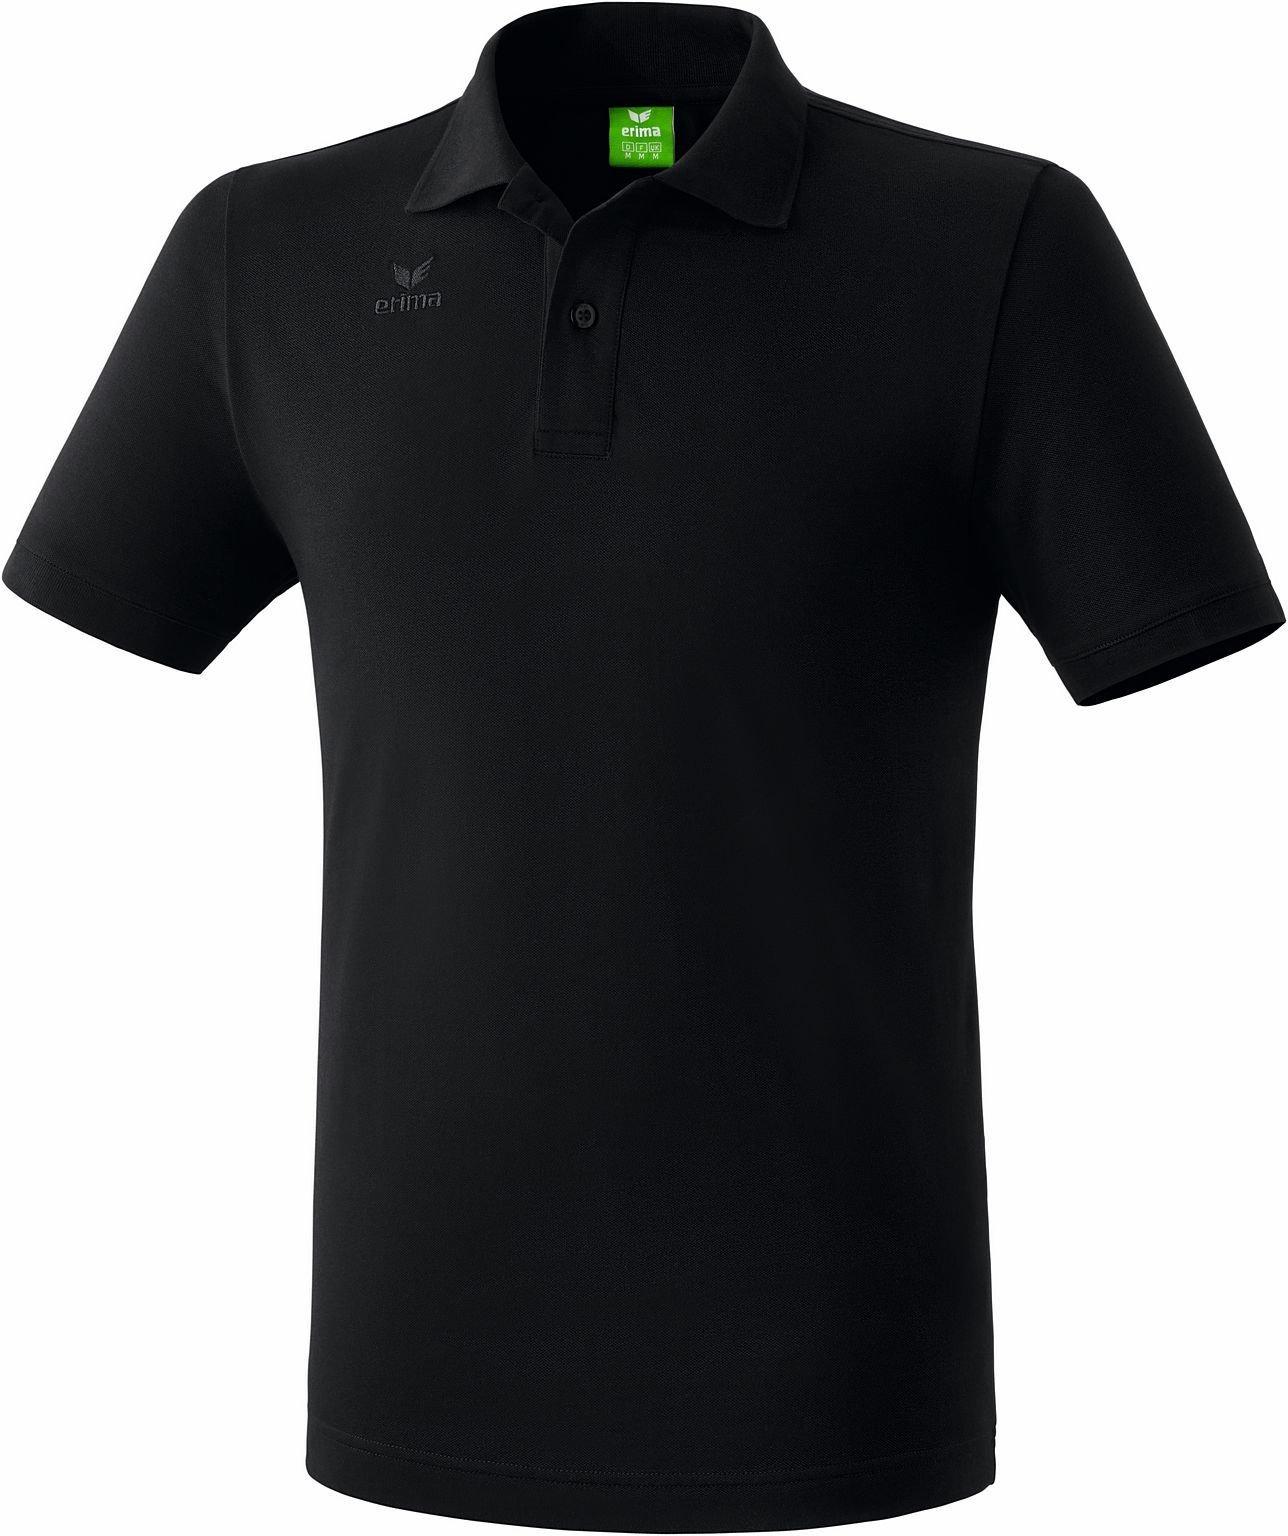 Baumwolle Poloshirt Herren a211330